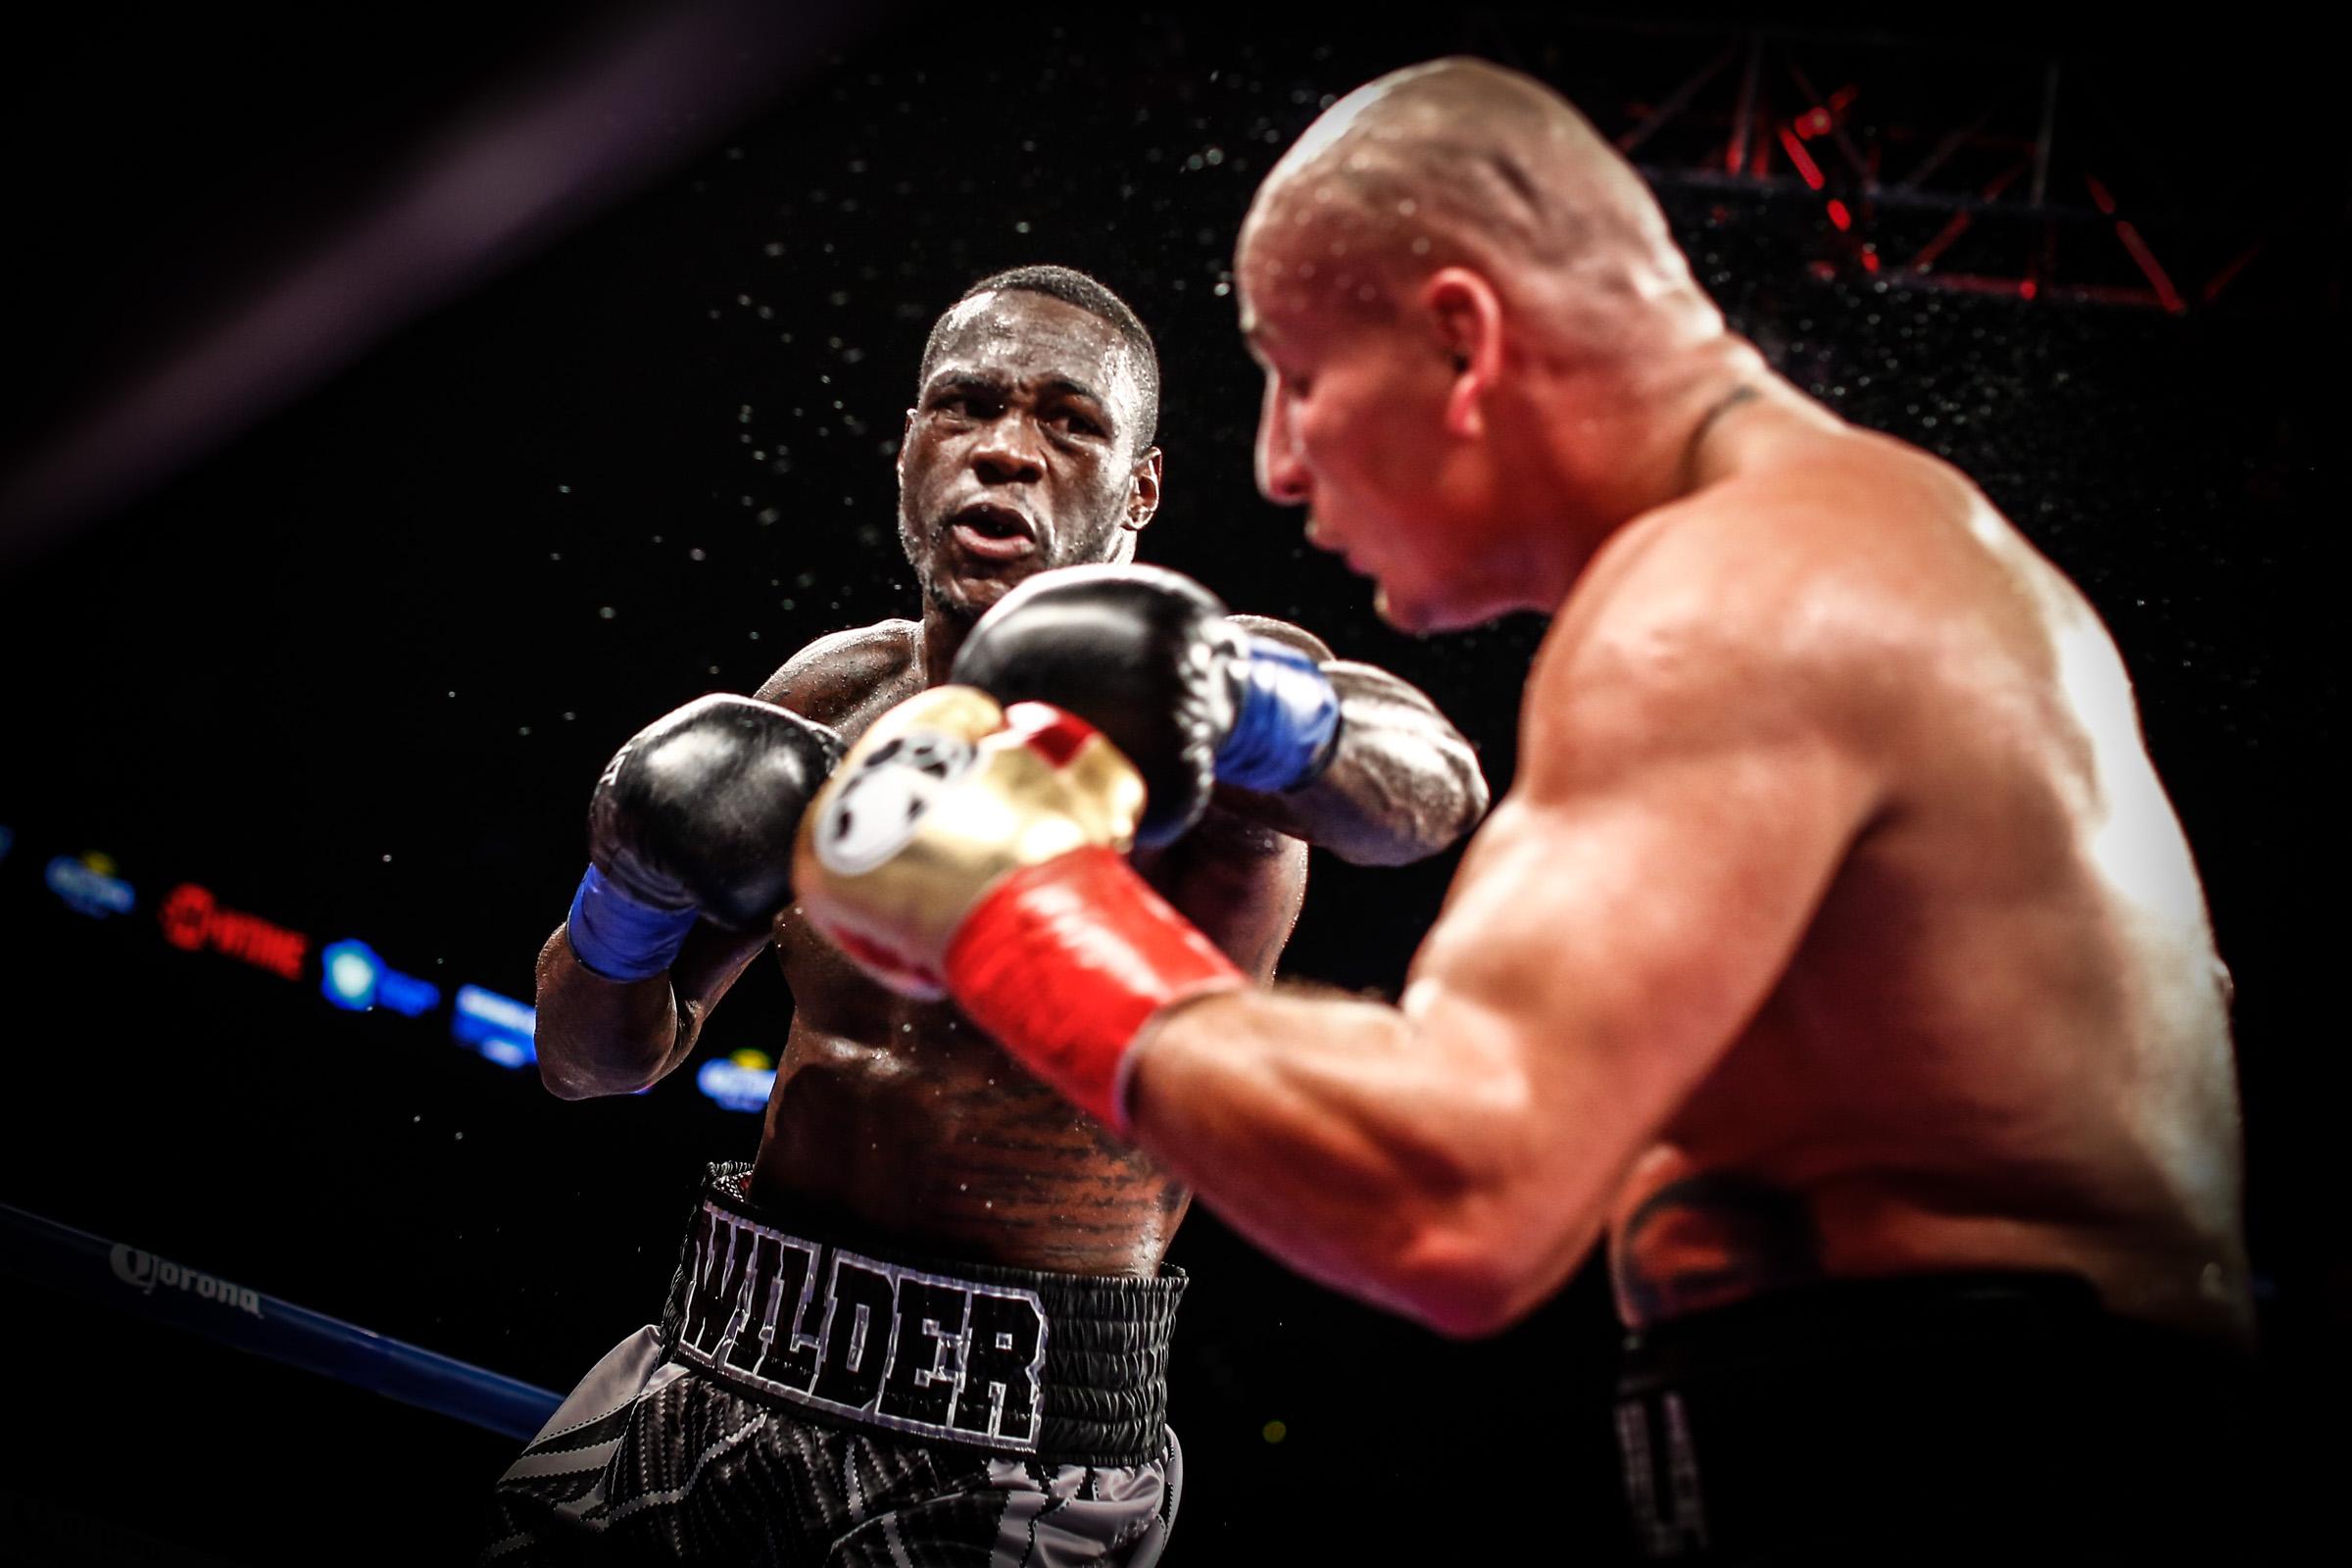 WILDER VS SZPILKA-FIGHT NIGHT-01162016-0961.jpg